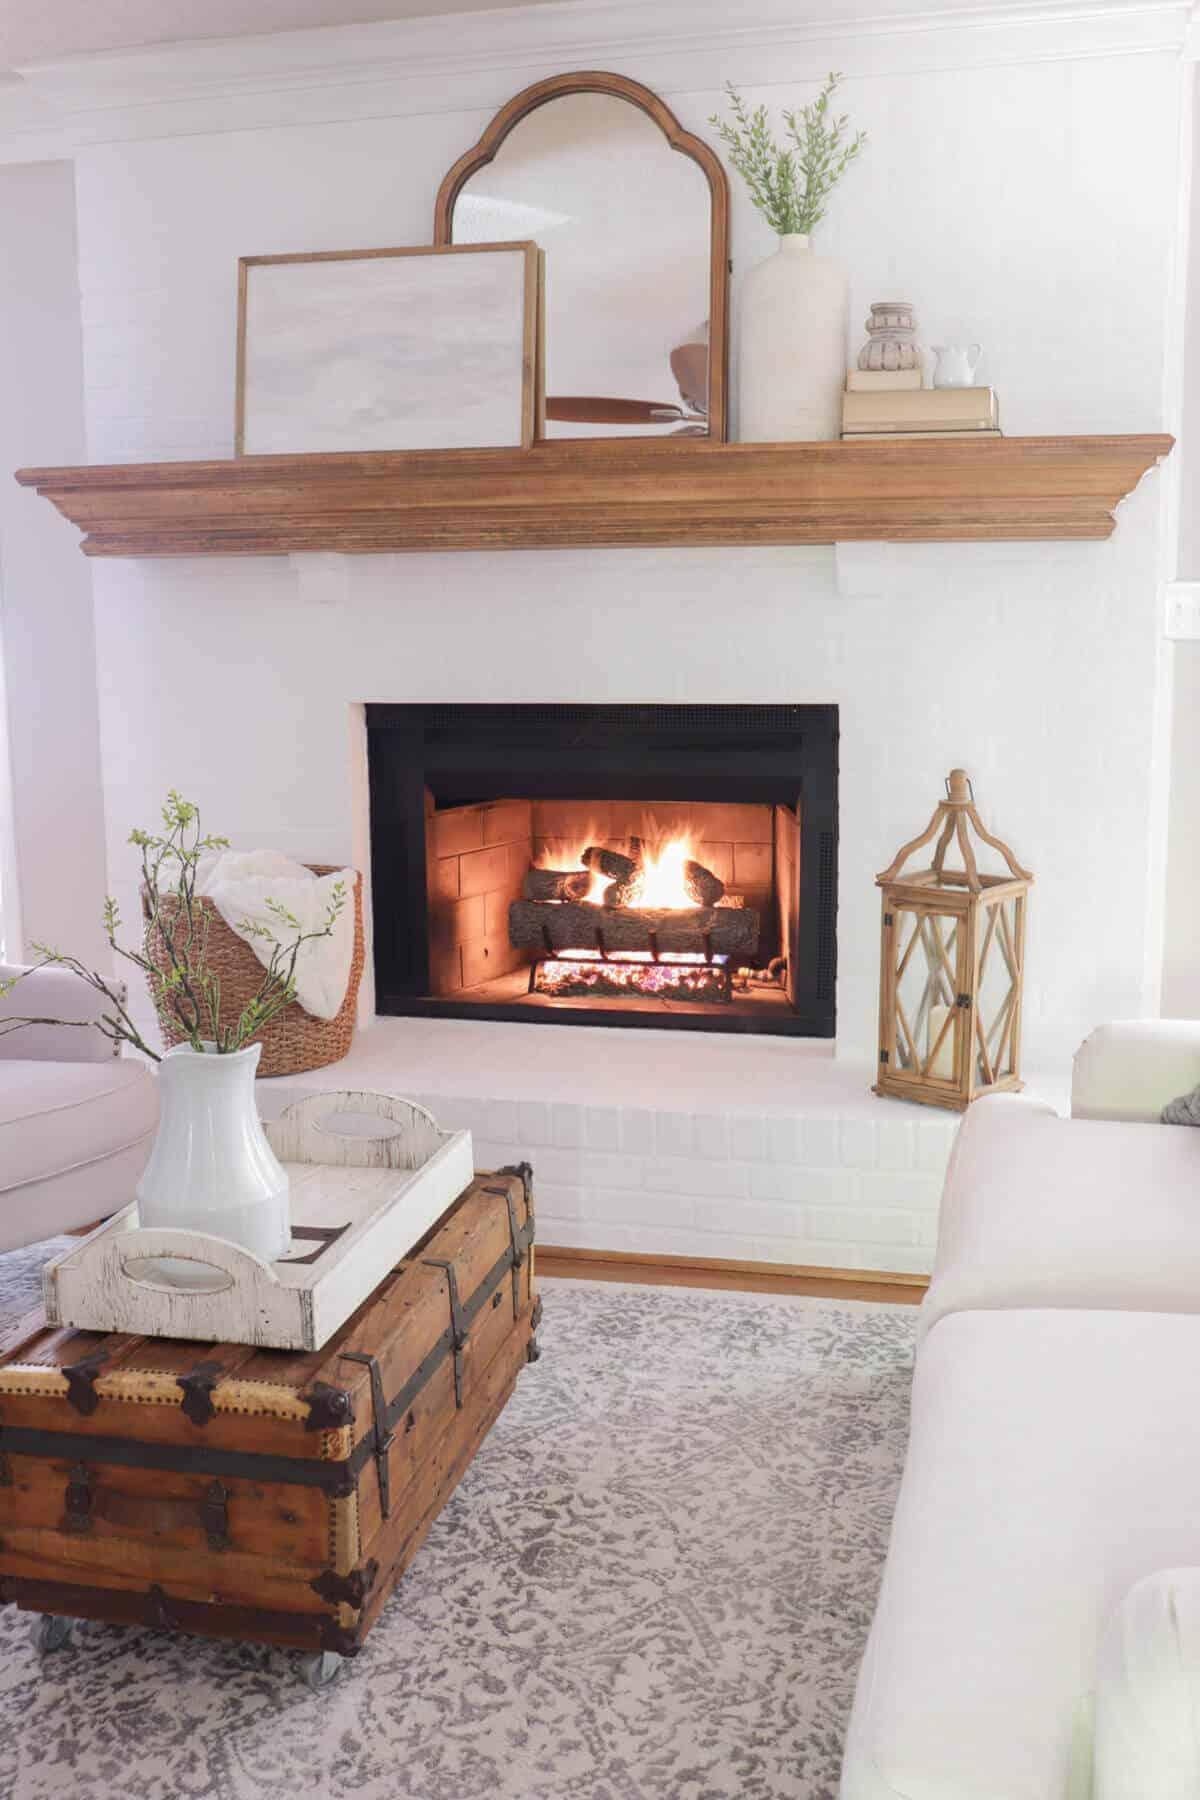 Romabio Lime slurry Fireplace with gas logs